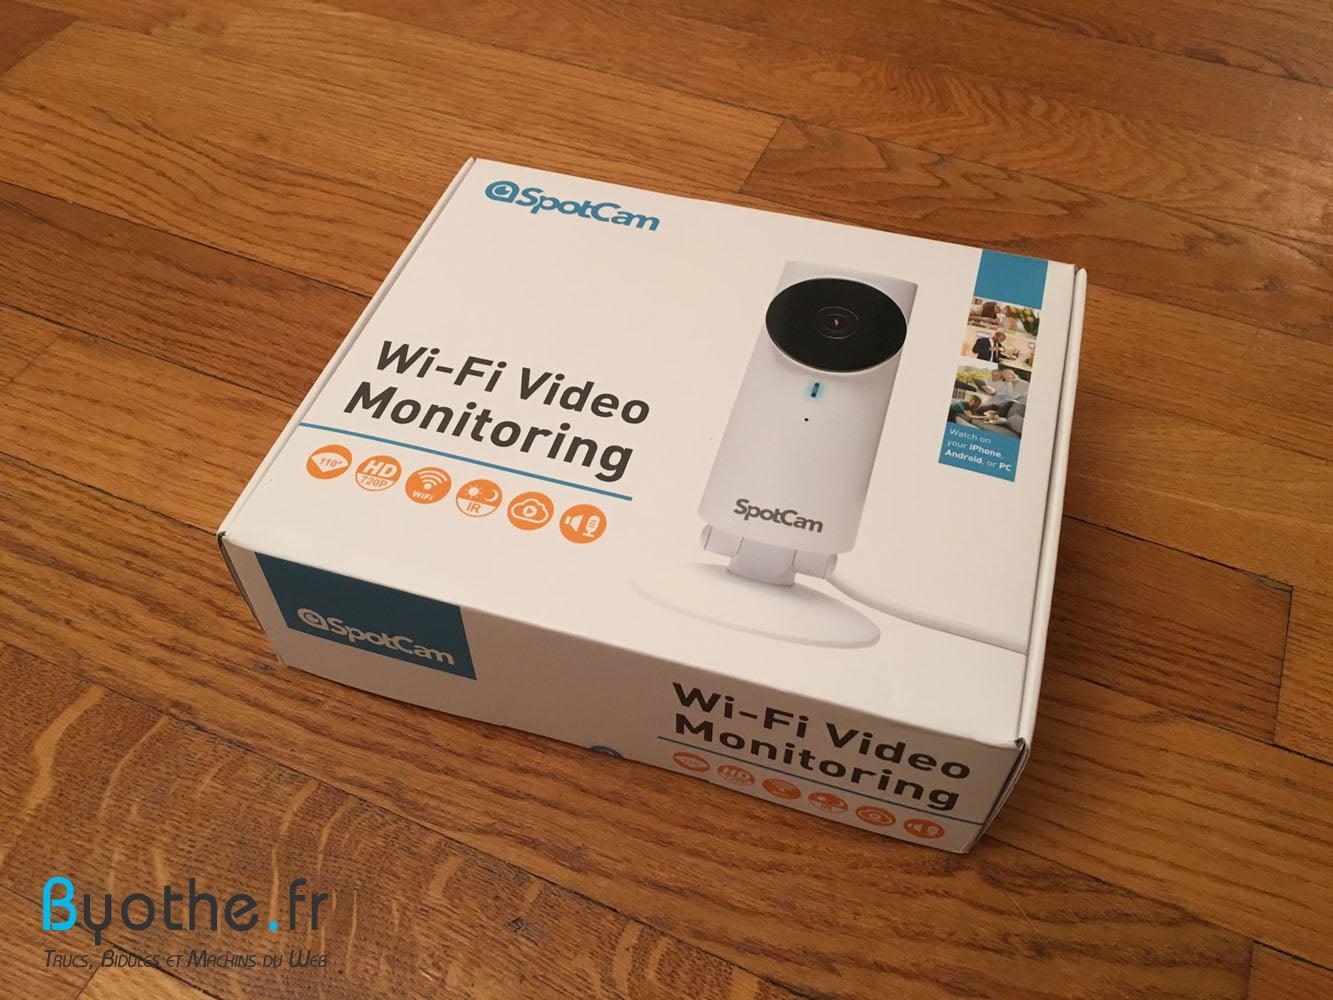 spotcam-boite Test de la caméra de surveillance WiFi SpotCam HD